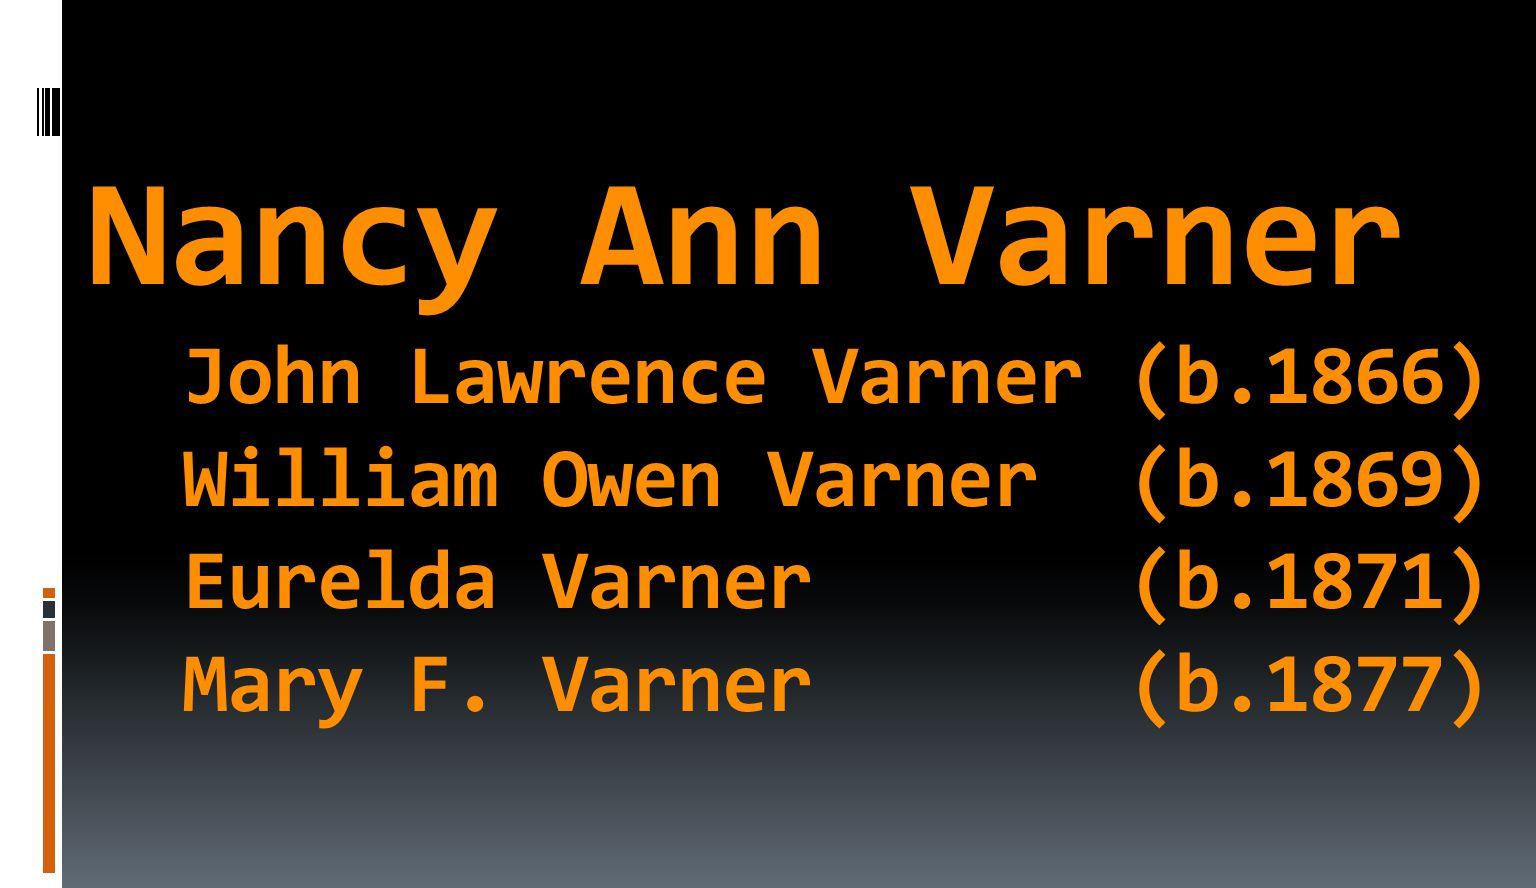 Nancy Ann Varner John Lawrence Varner (b.1866) William Owen Varner (b.1869) Eurelda Varner (b.1871) Mary F.